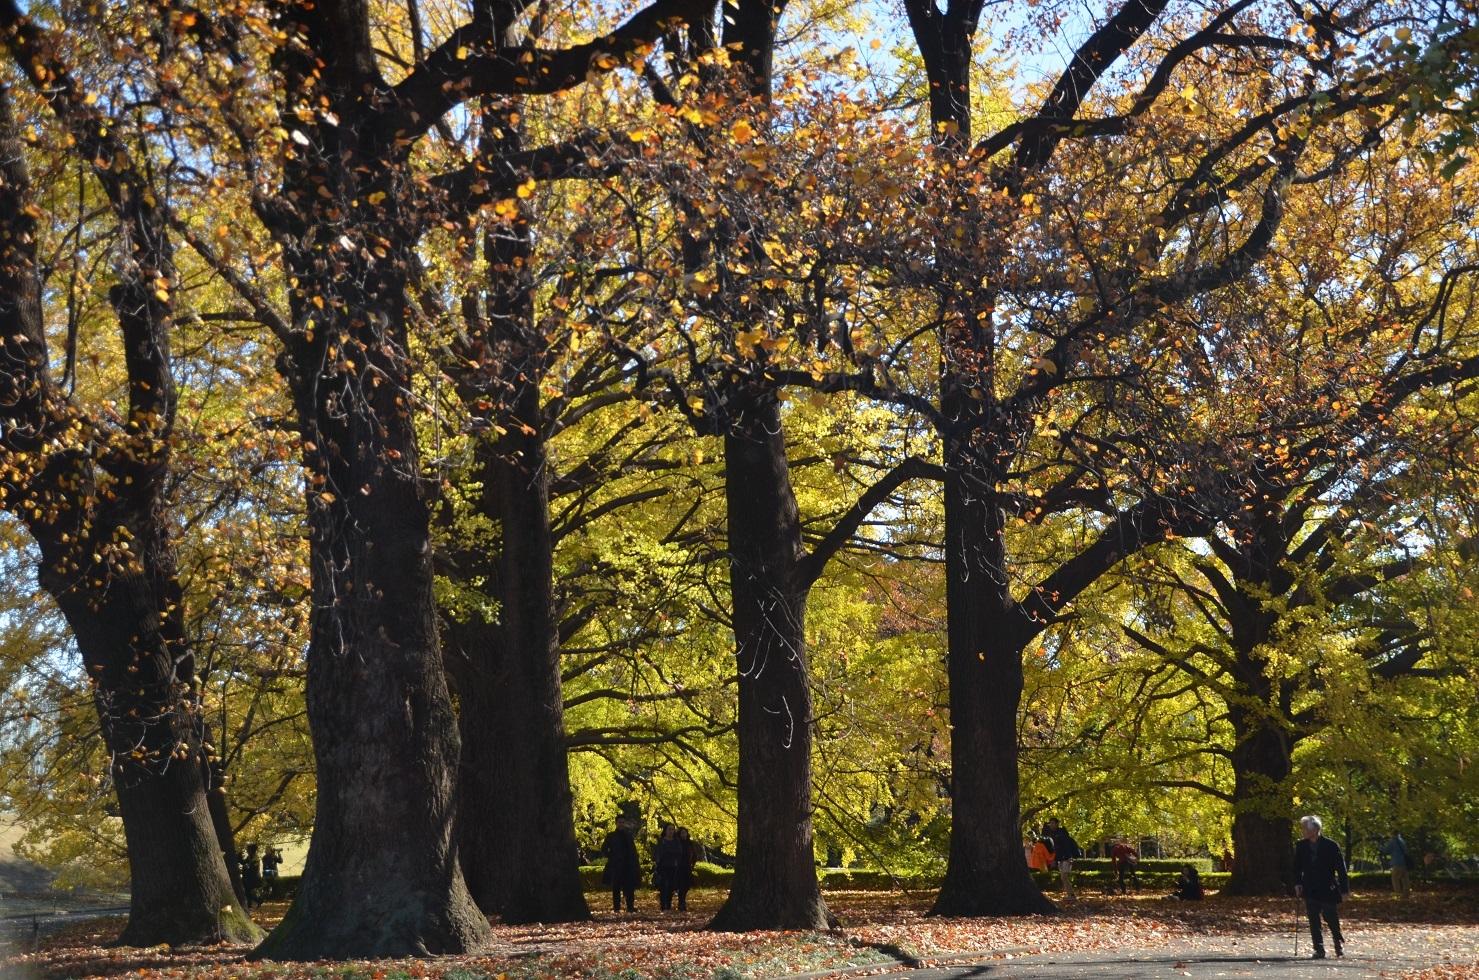 DSC_0244ユリの木と人